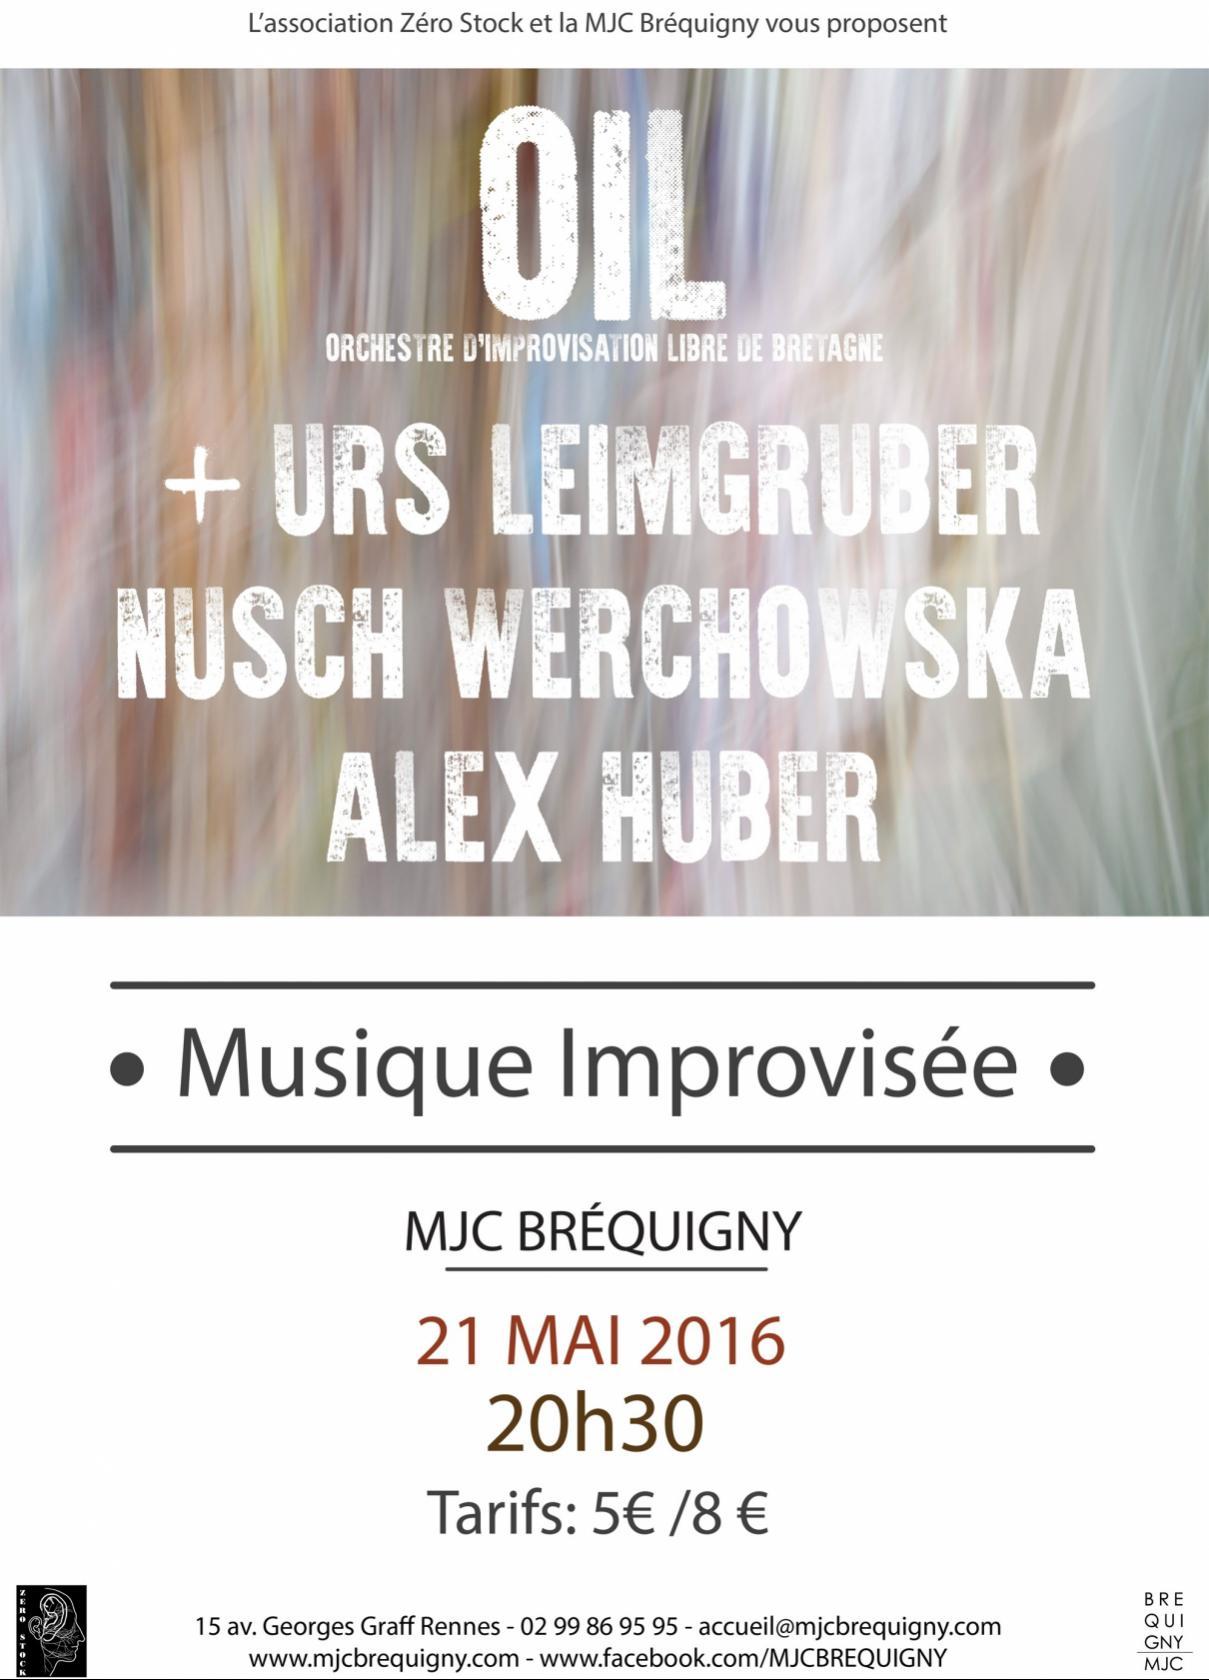 Improvisation : OIL, N. Werchowska, U. Leimgrubber et A. Huber Rennes